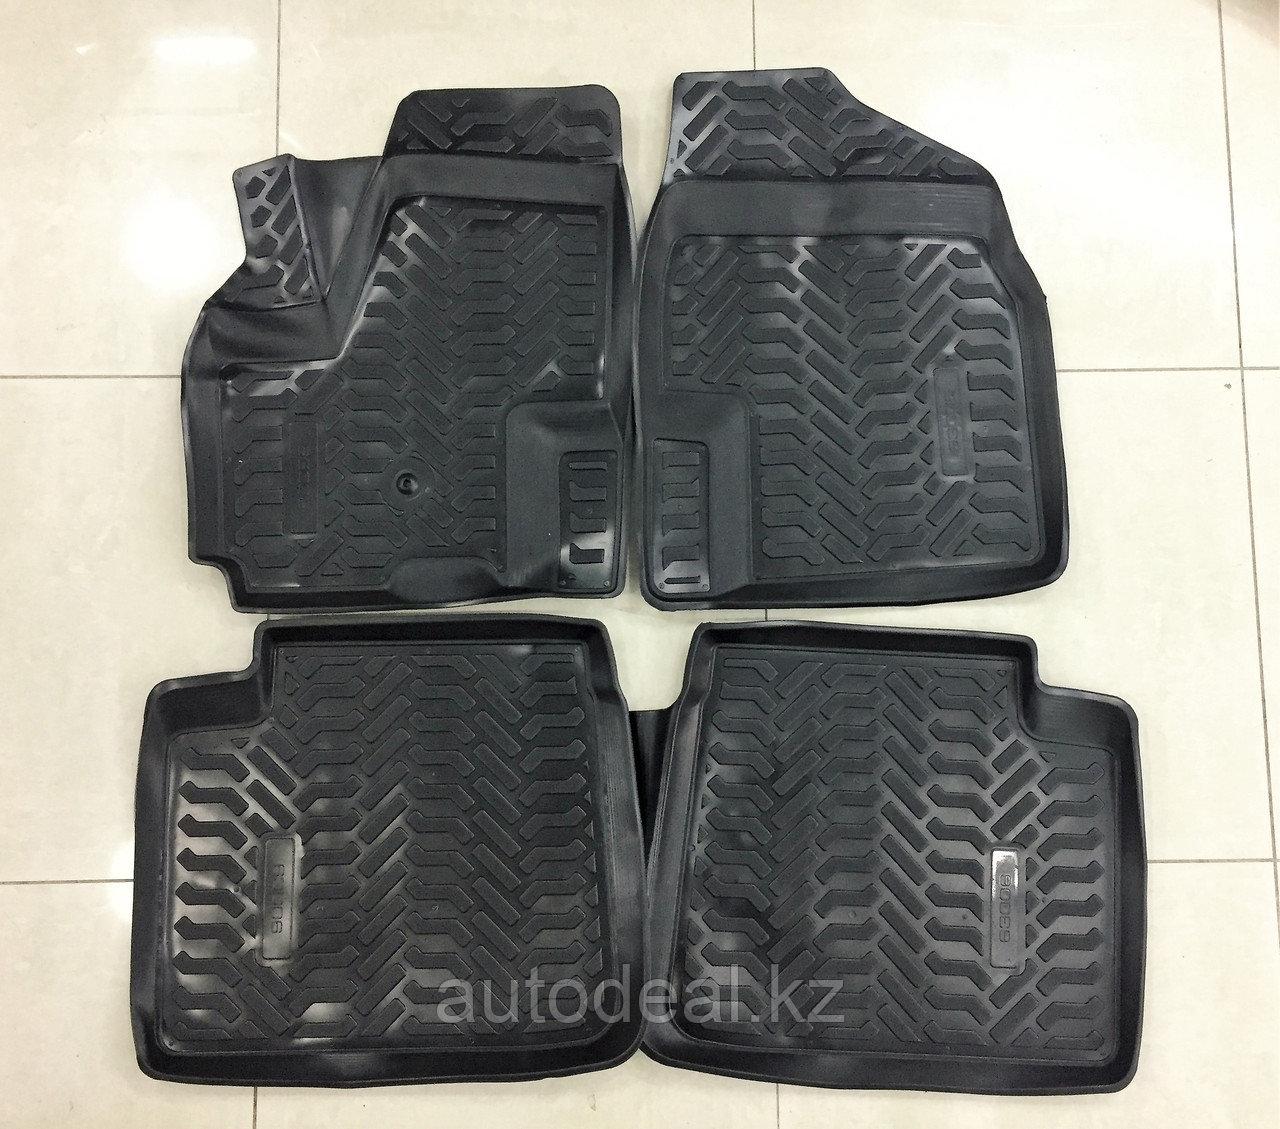 Коврики в салон полиуретан (Aleron) Lifan X60  / Vrhicle floor mats polyurethane